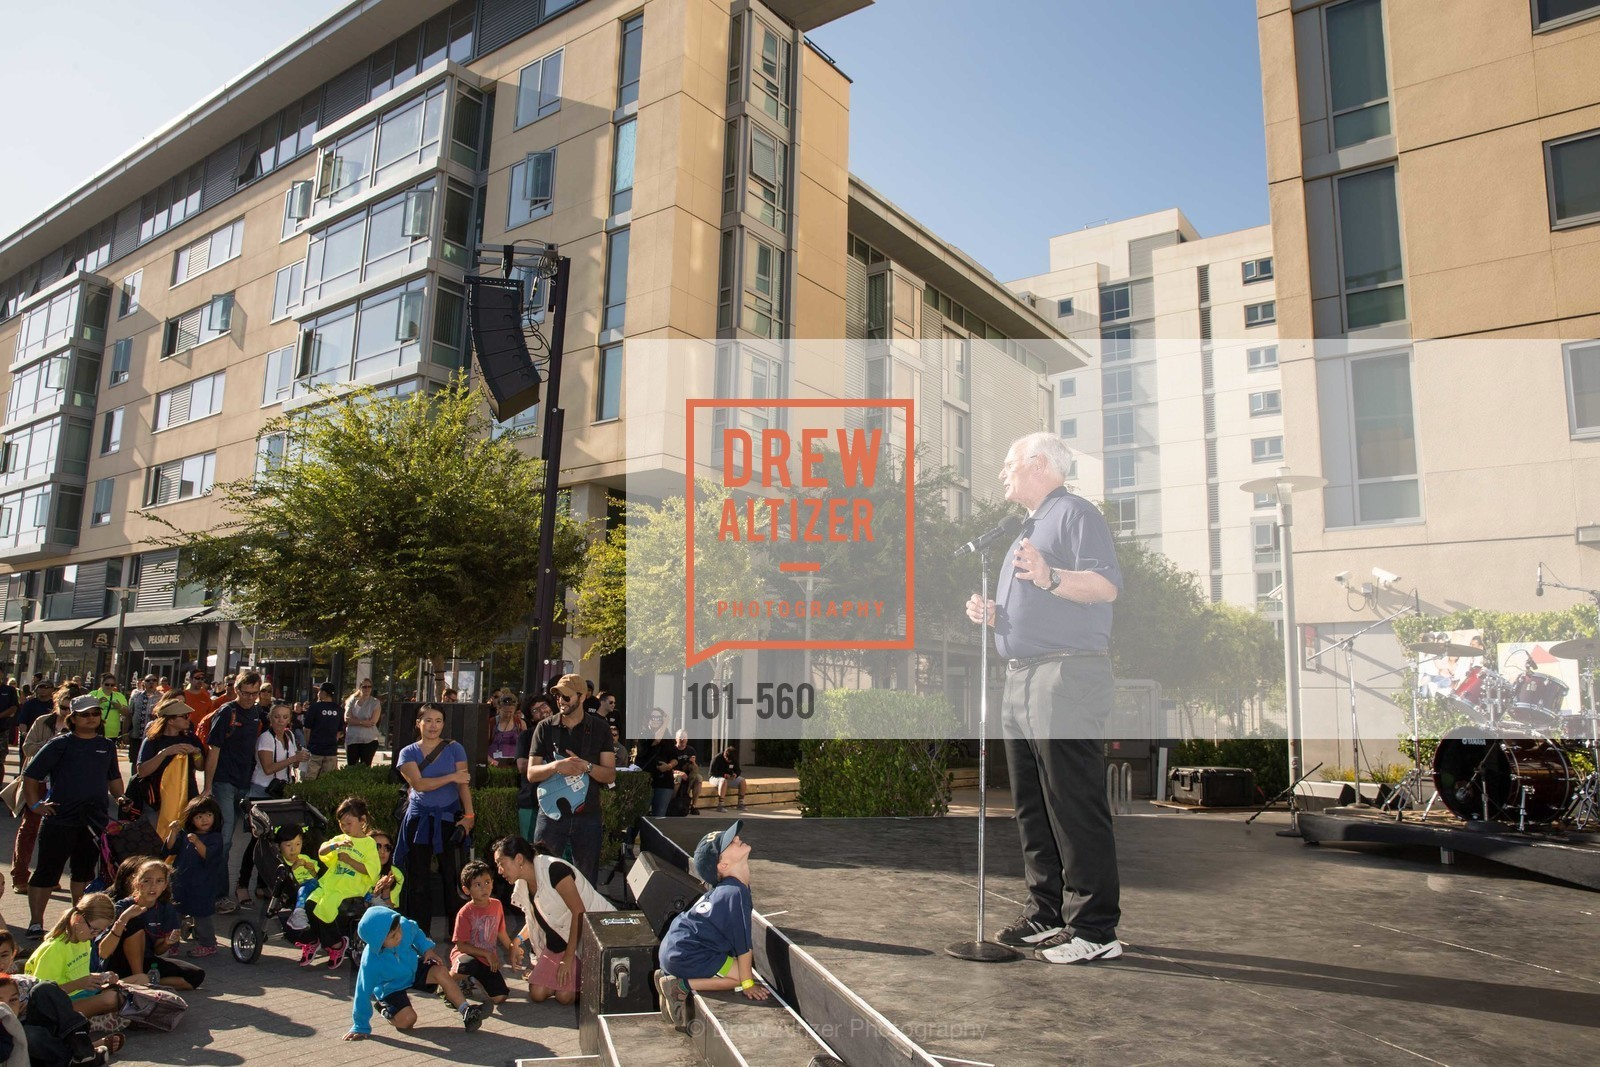 Mark Laret, UCSF Medical Center HARD HAT WALK & LIGHTS ON FESTIVAL, US, September 6th, 2014,Drew Altizer, Drew Altizer Photography, full-service event agency, private events, San Francisco photographer, photographer California